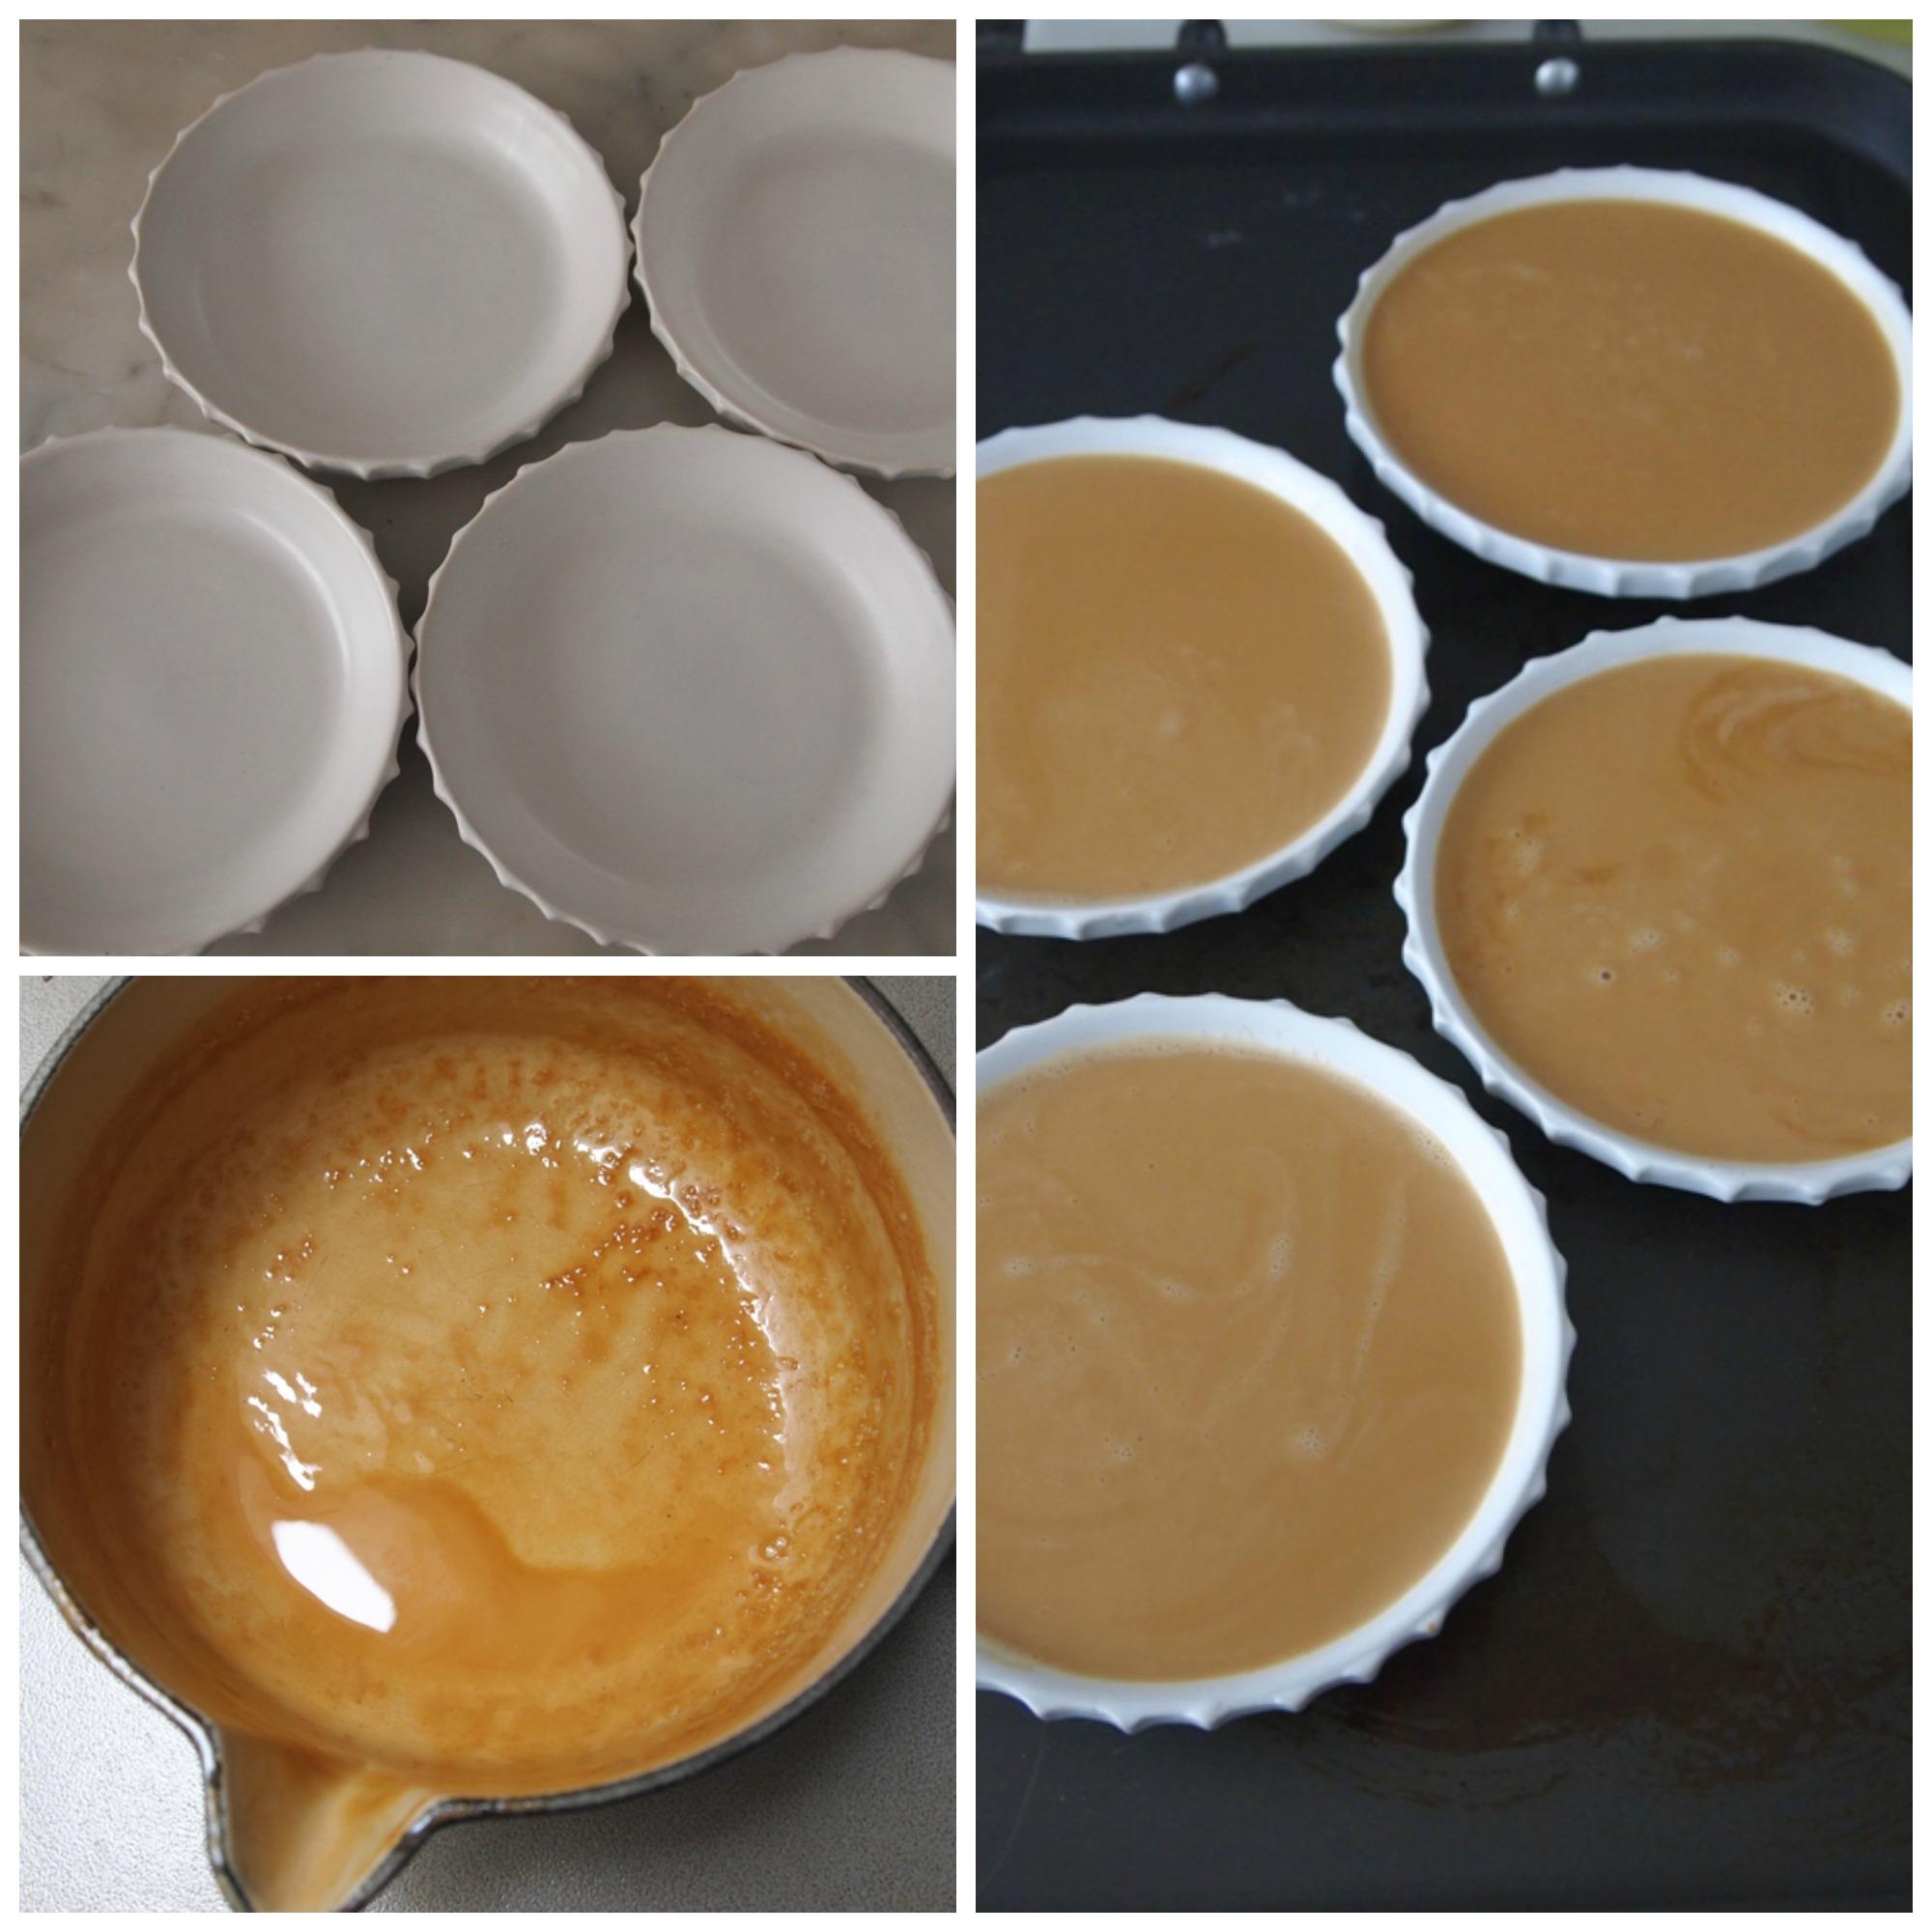 Algarrobina Crème brûlée